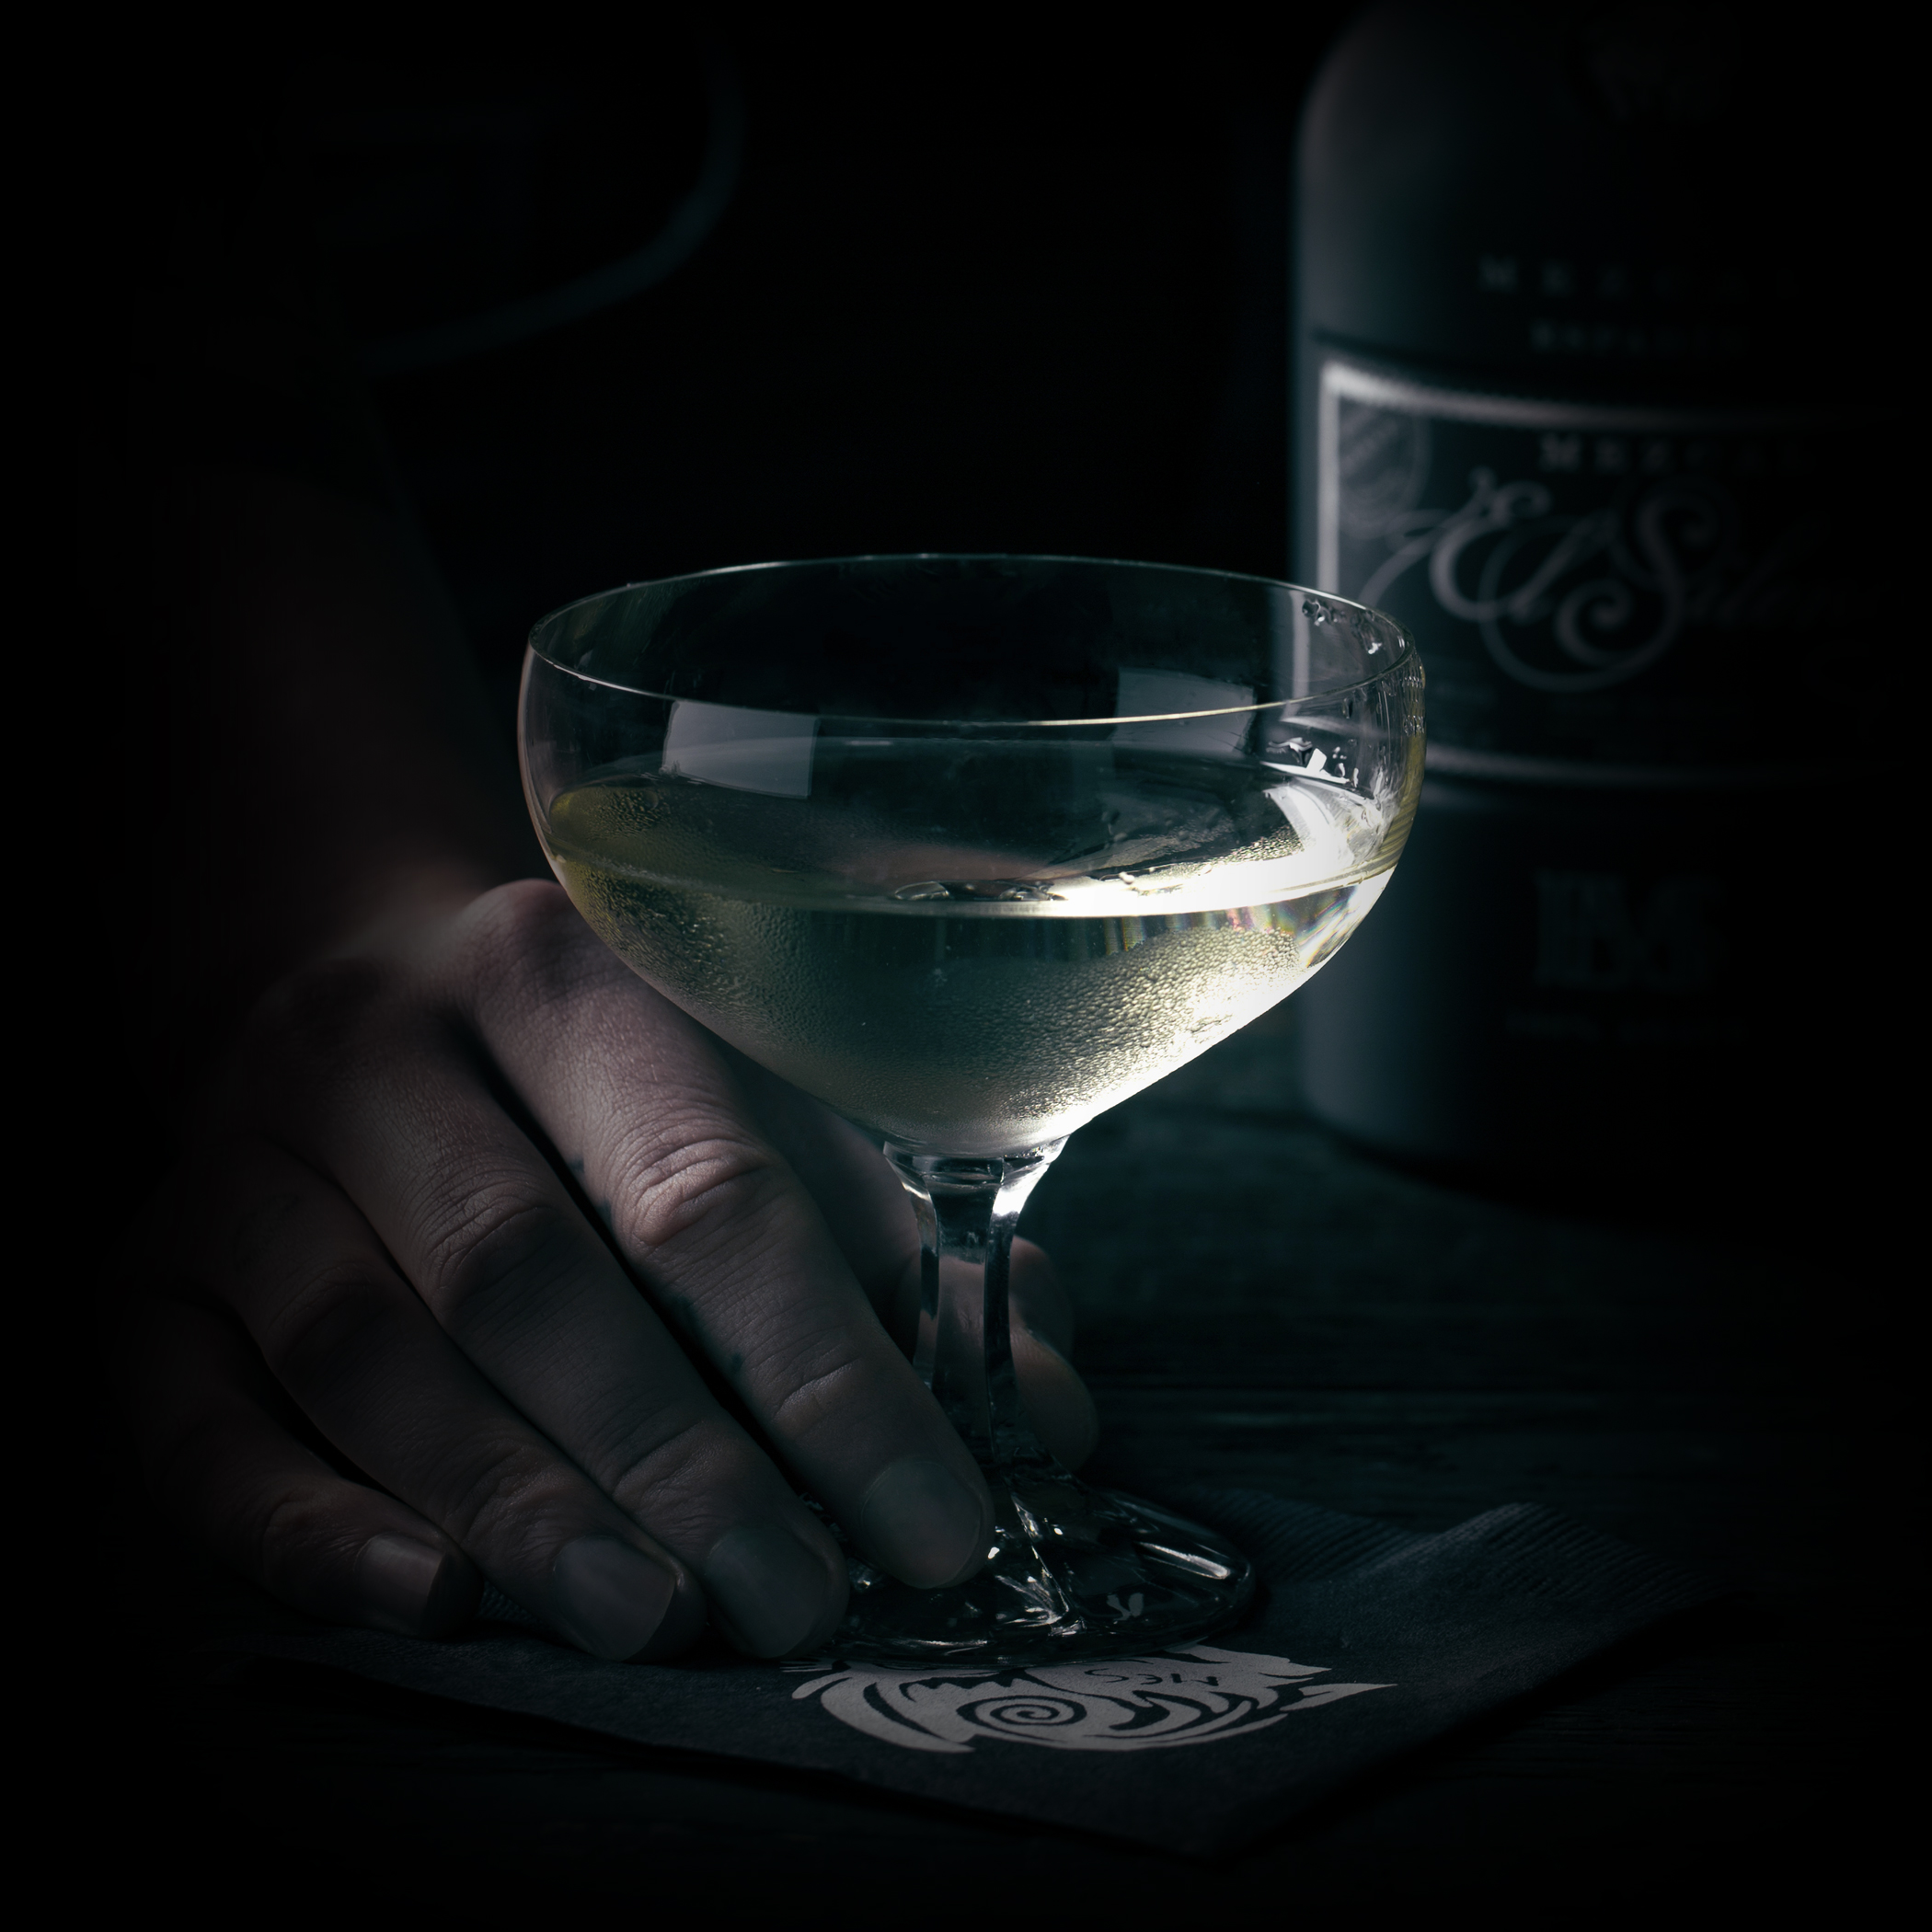 THE MEZCAL DIRTY MARTINI    INGREDIENTS  - .5 oz. El Silencio Espadin  - 2 oz. Vodka  - .5 oz. Castelvetrano Olive Juice  METHOD  Shake & Strain  Castelvetrano Olives - Cocktail Glass